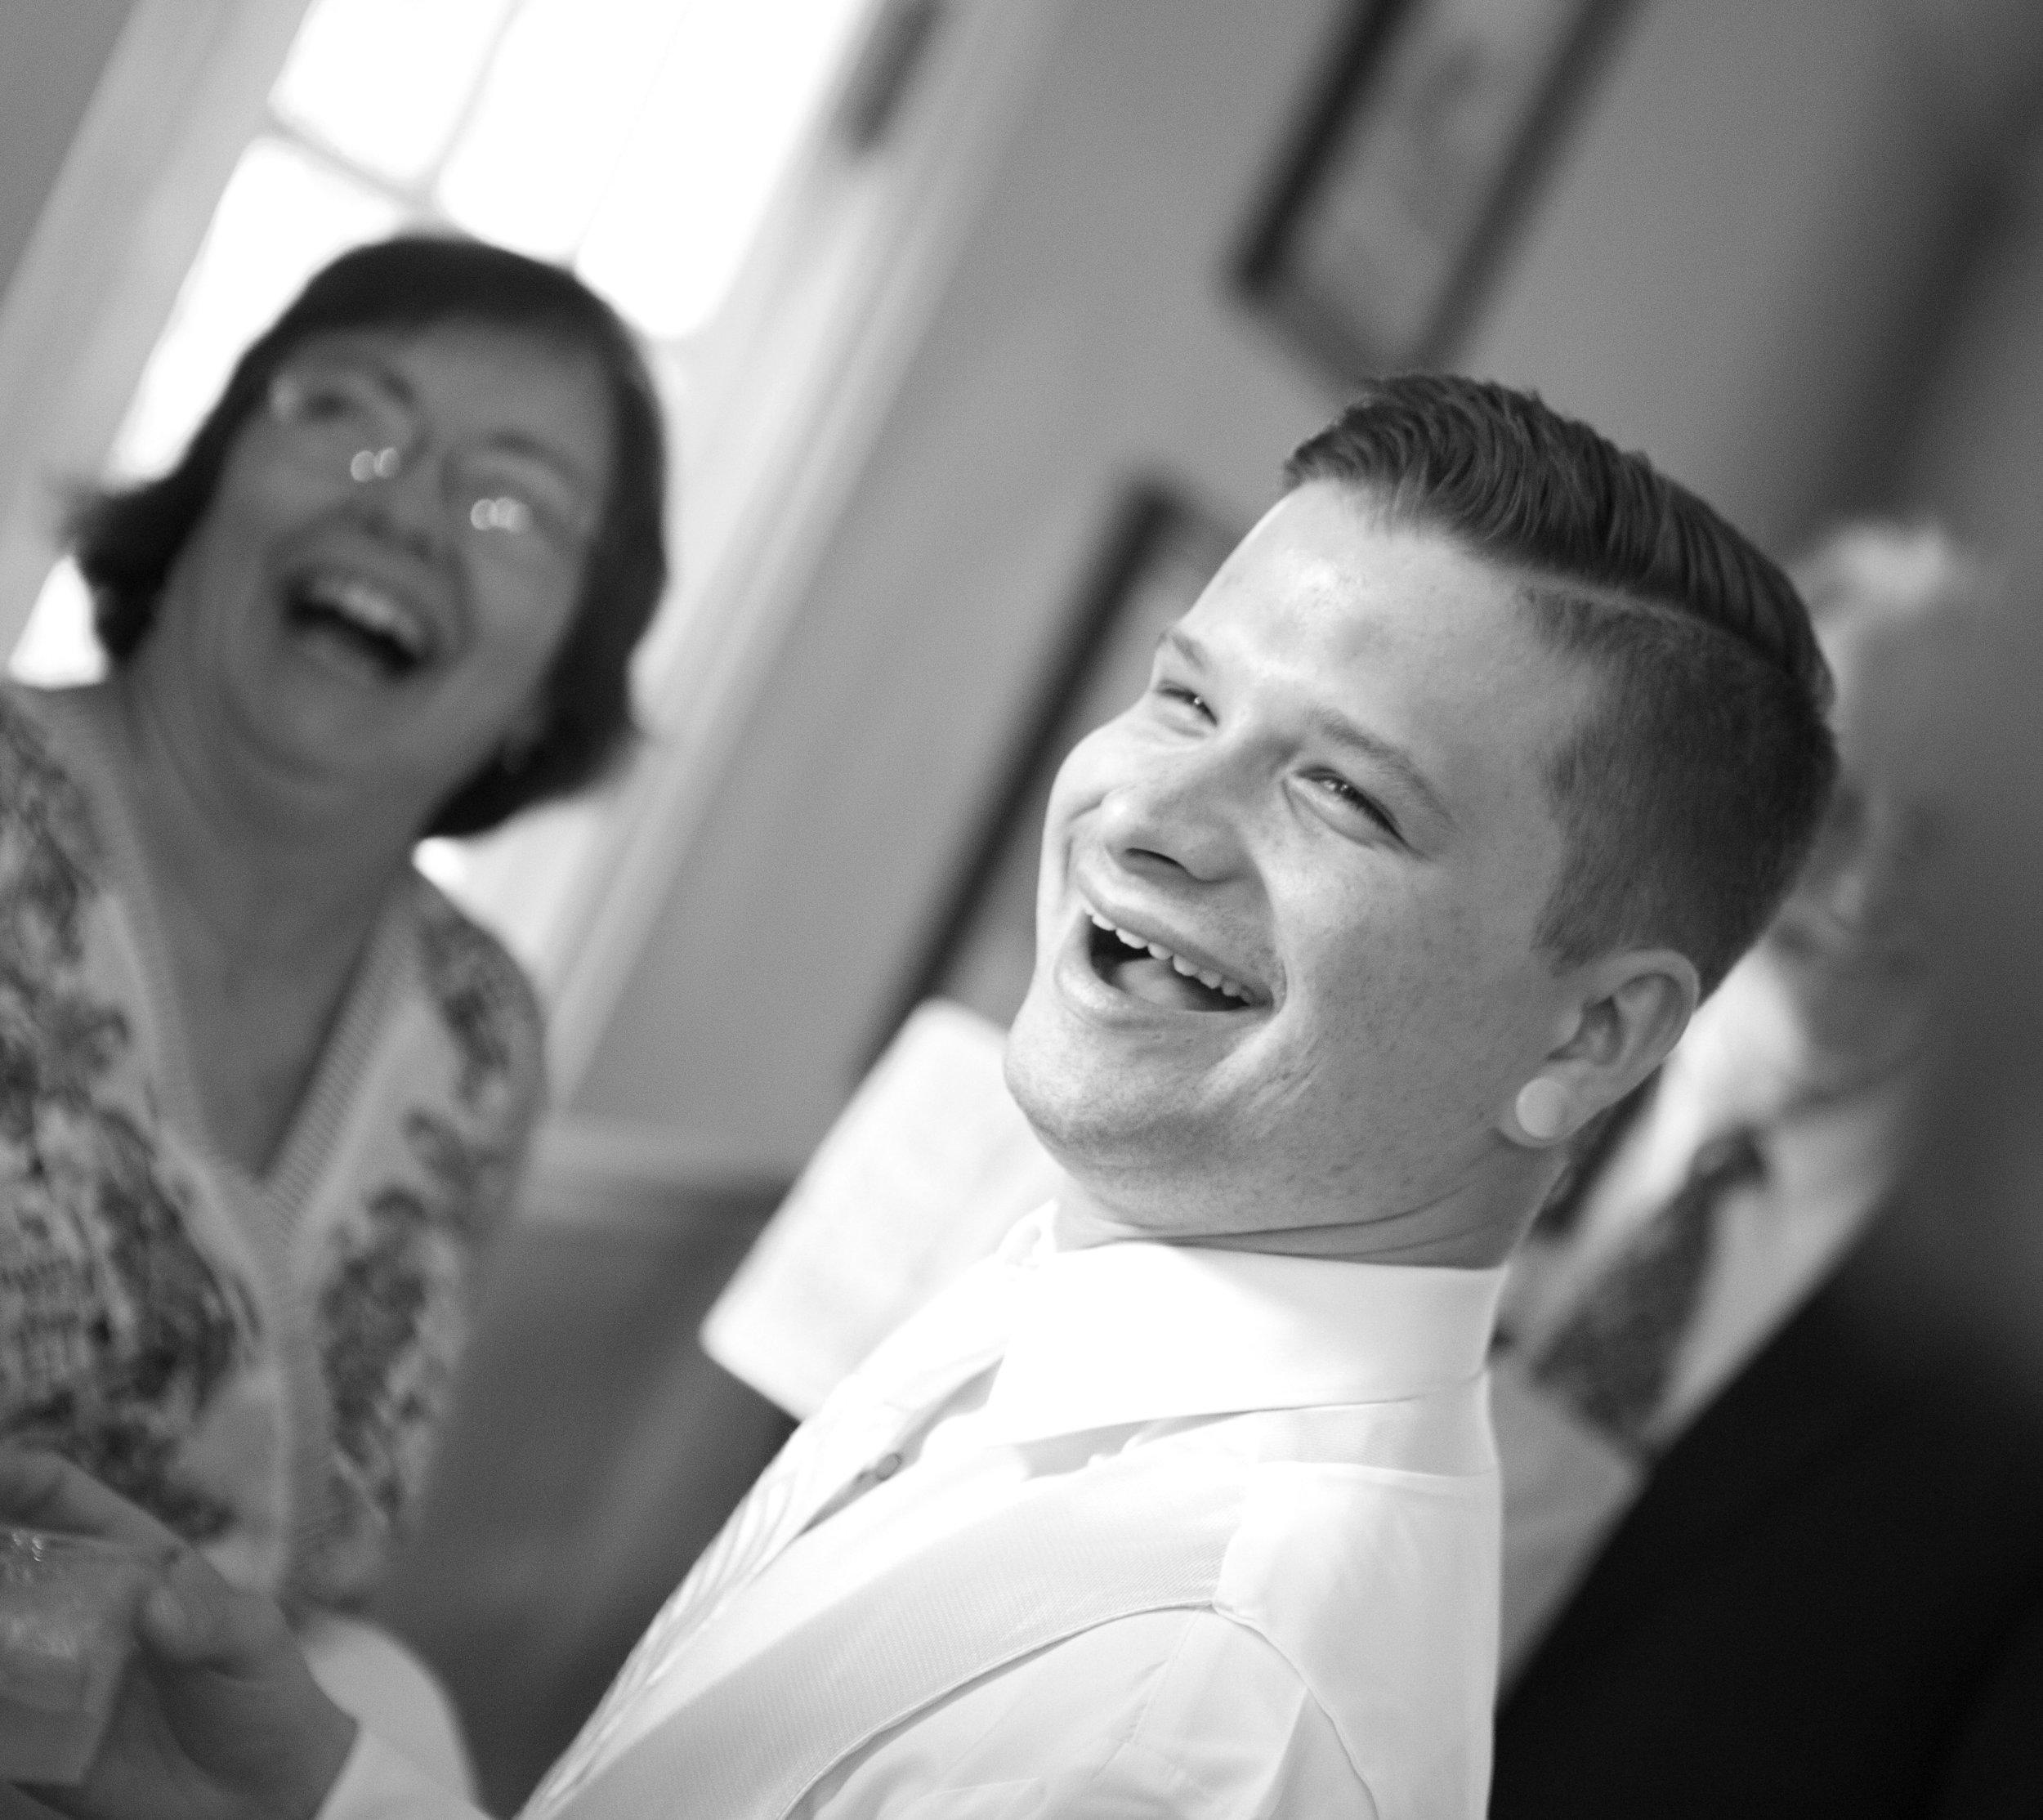 Getting ready photo by the Atlanta wedding photographers at AtlantaArtisticWeddings